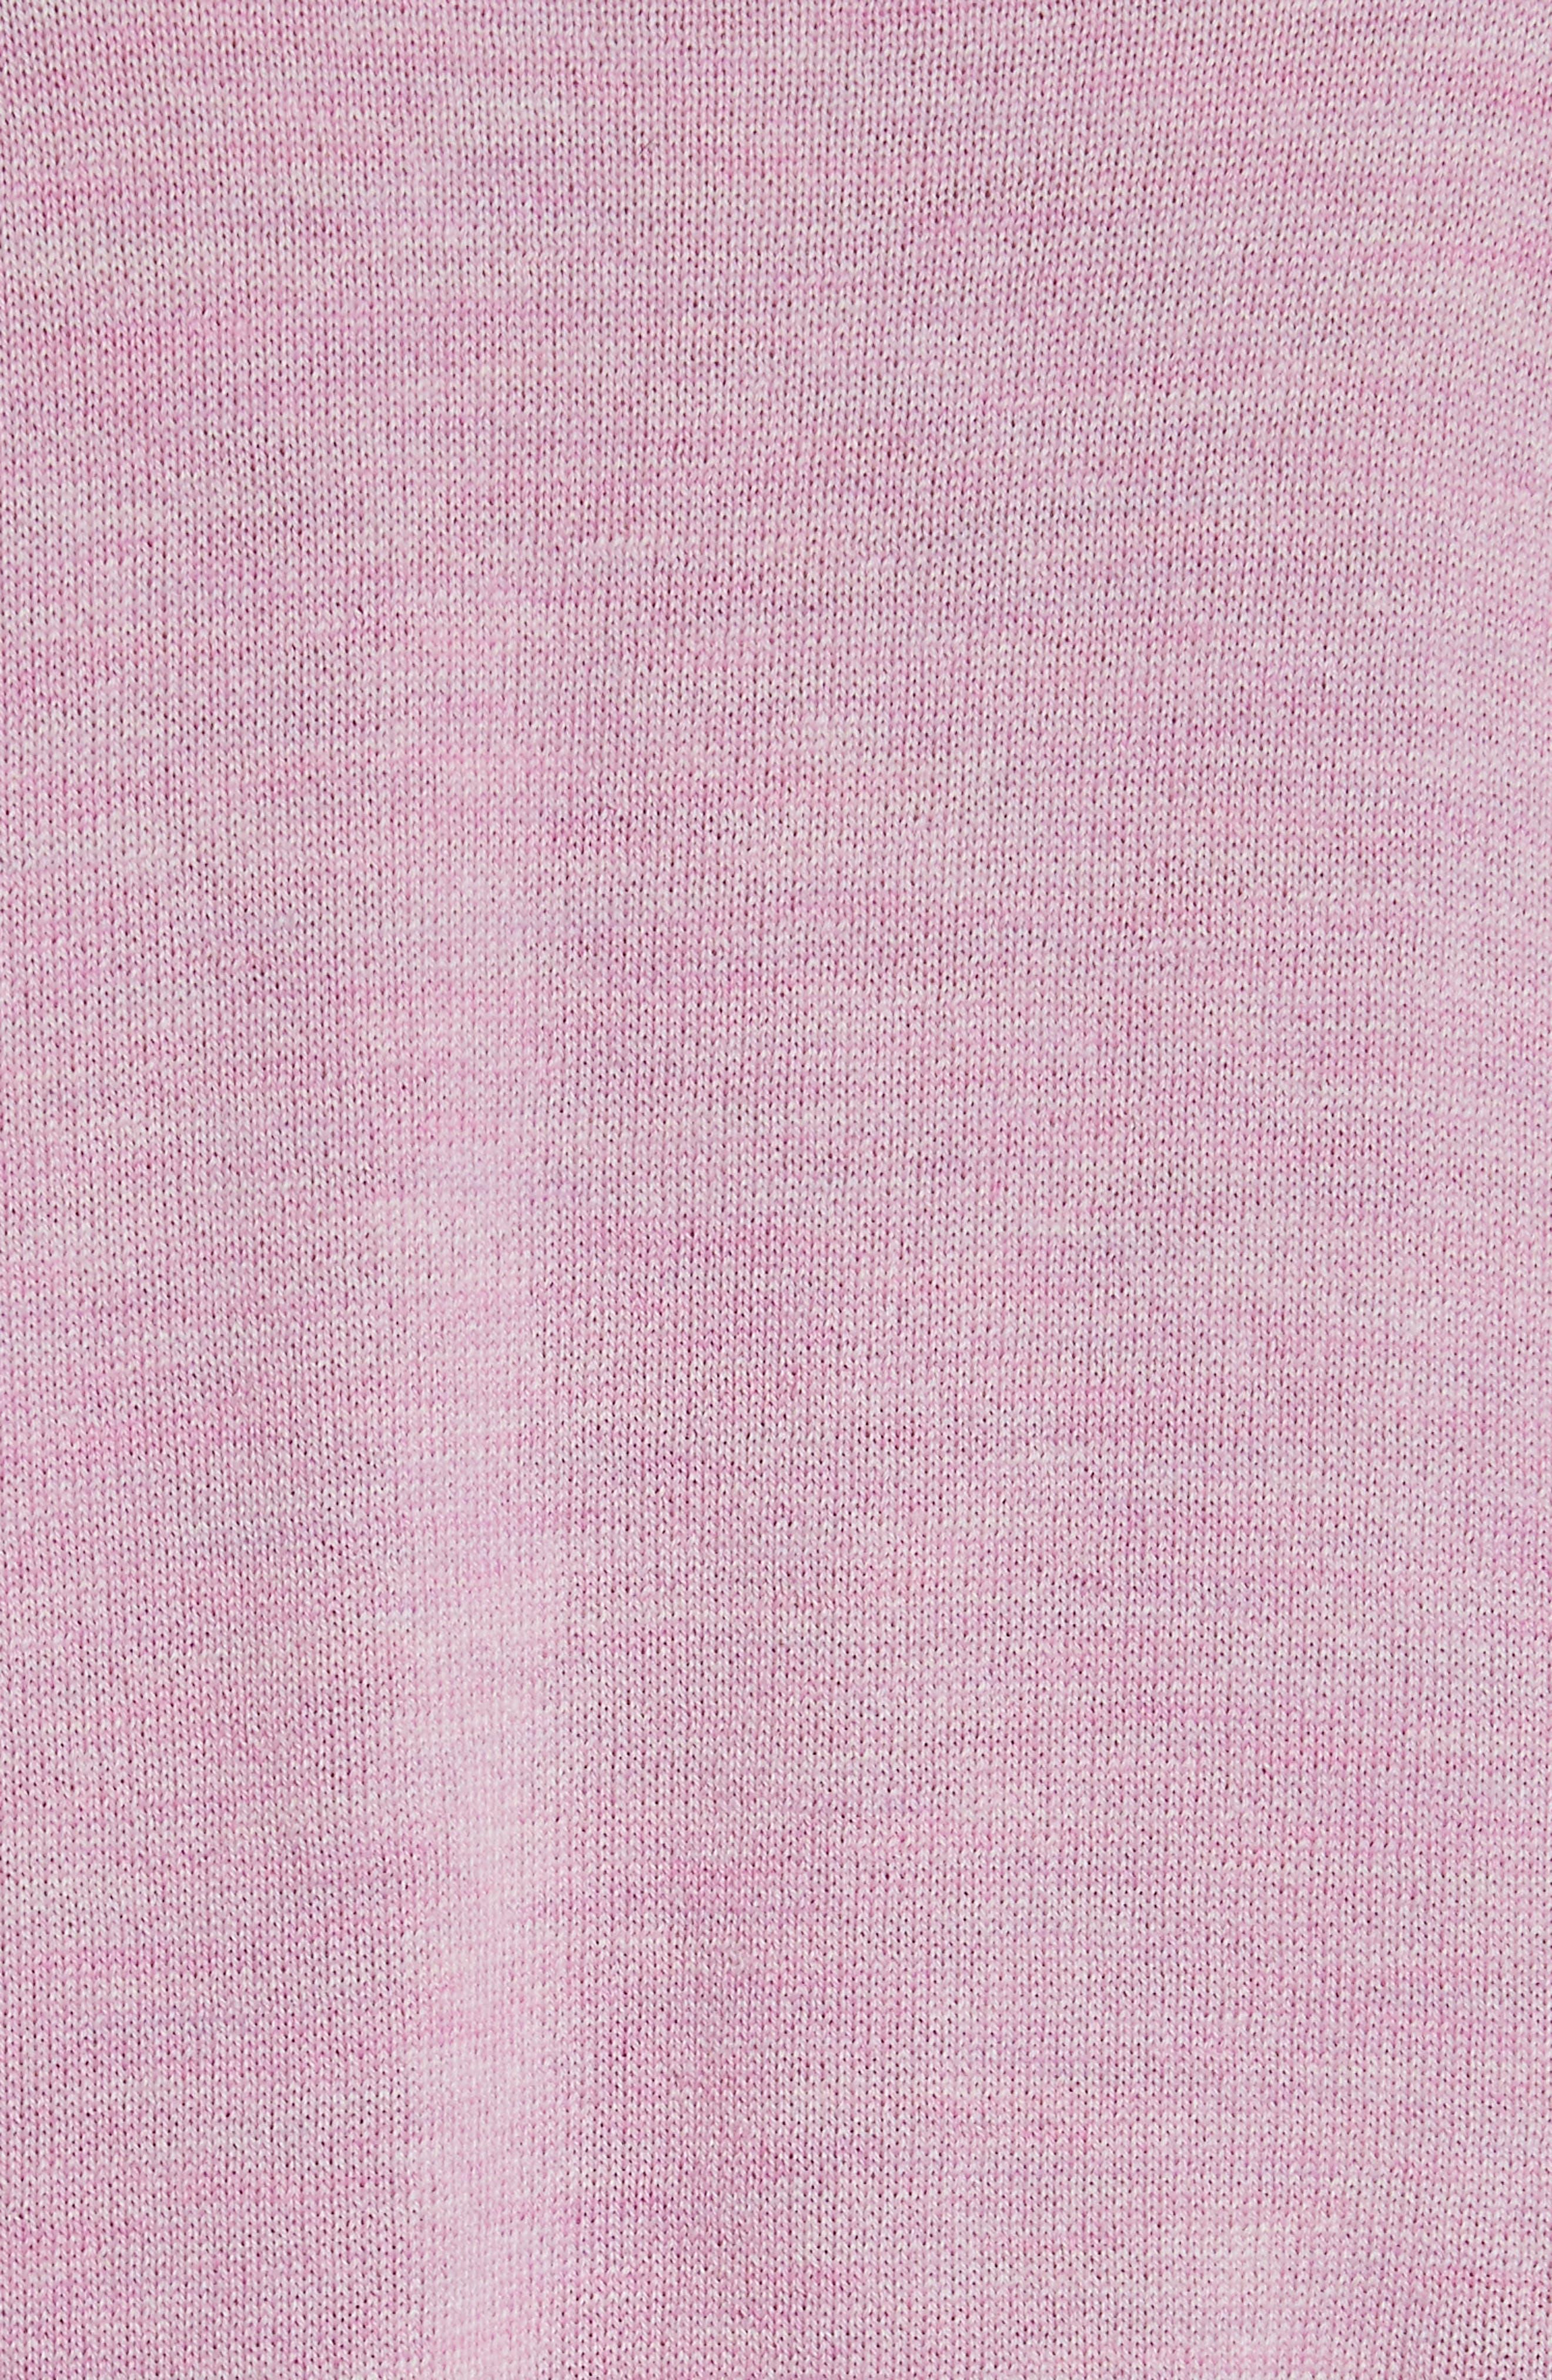 Turtleneck Merino Wool Sweater,                             Alternate thumbnail 5, color,                             691